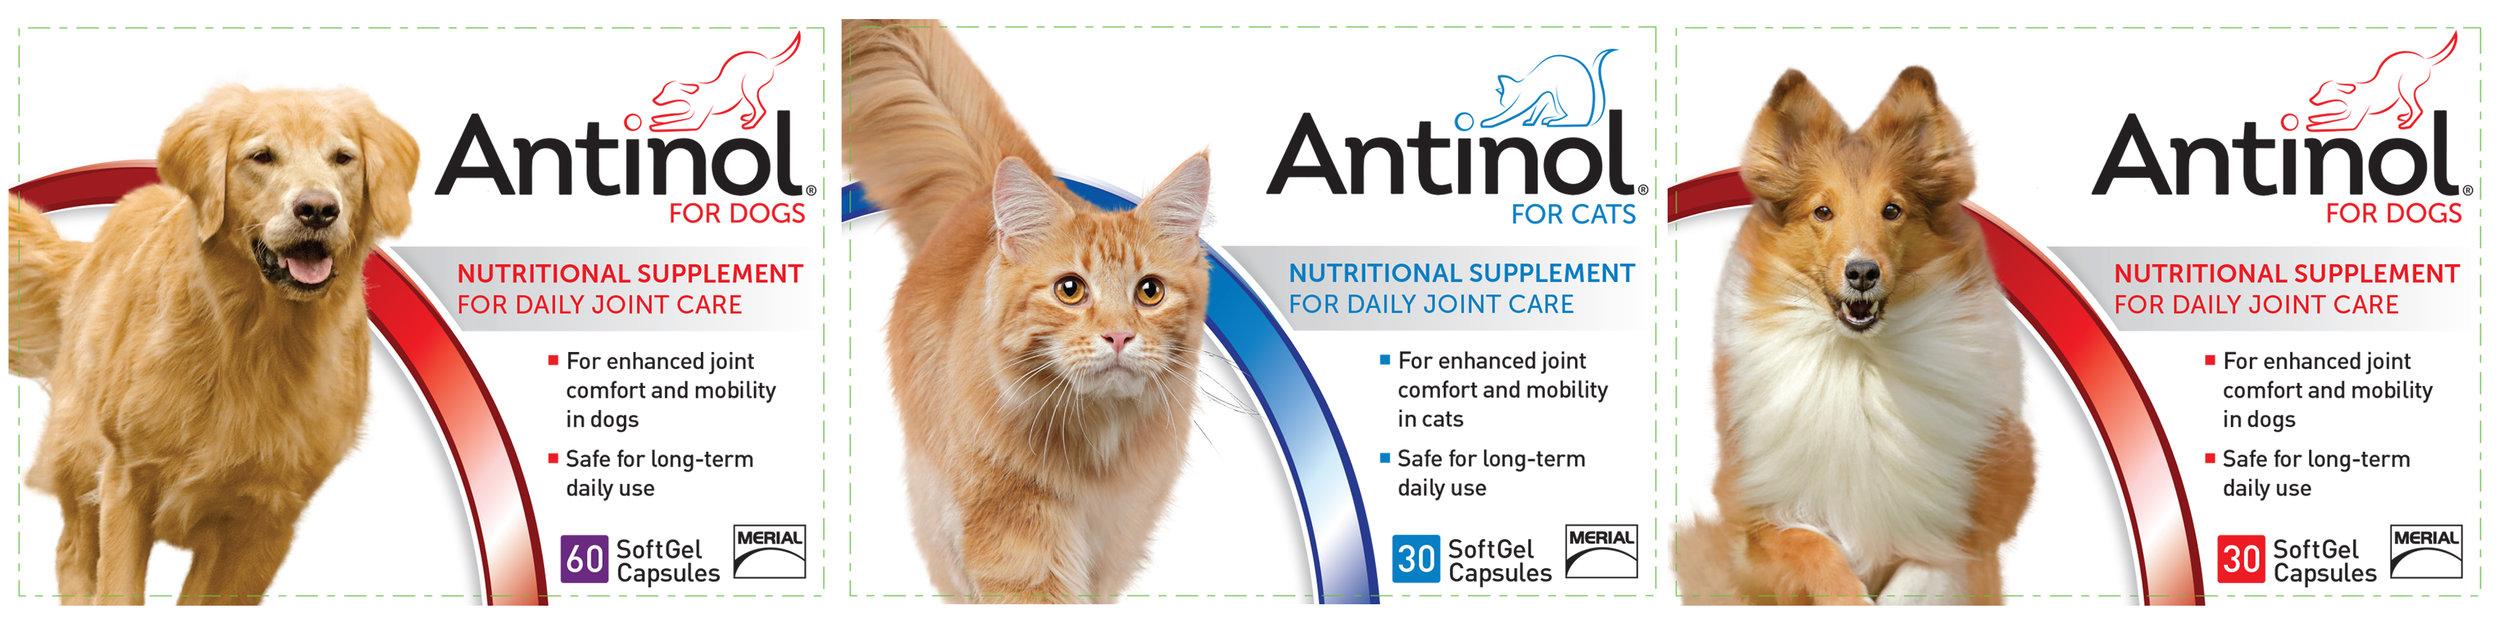 Antinol